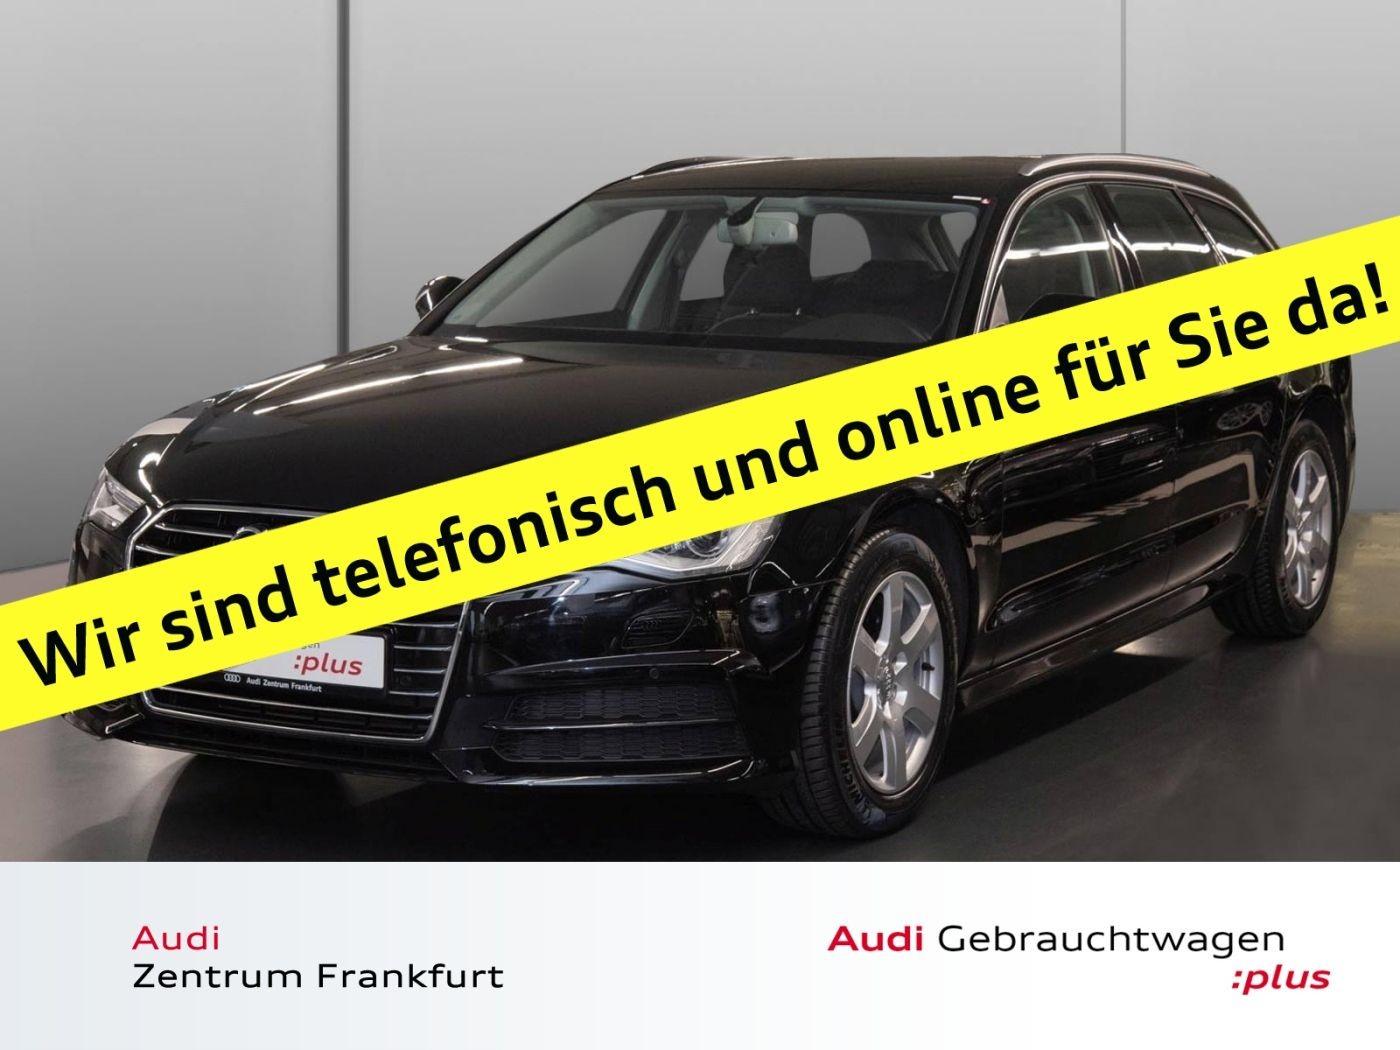 Audi A6 Avant 1.8 TFSI ultra S tronic Navi Xenon Tempomat, Jahr 2017, Benzin